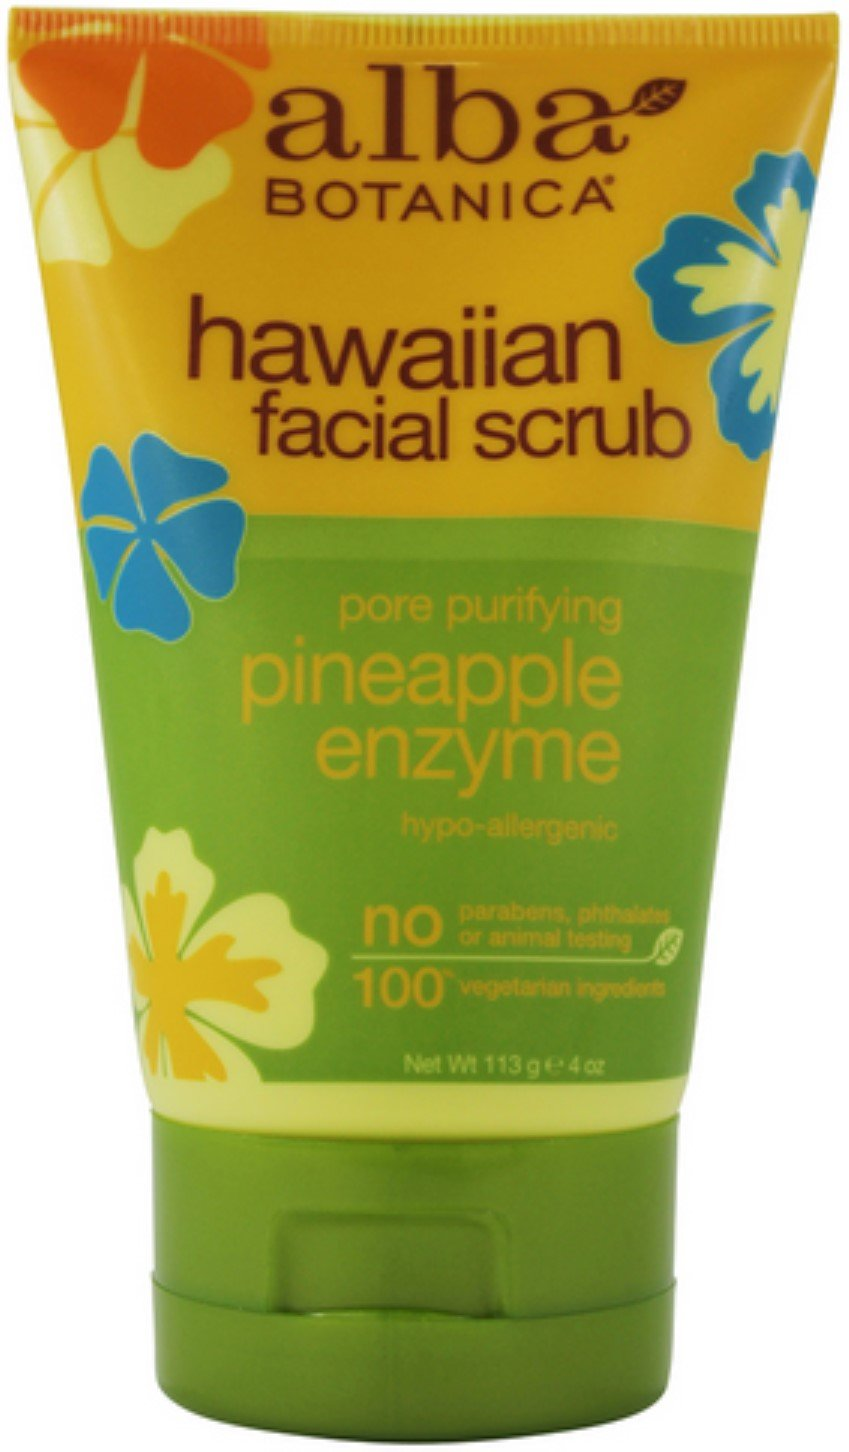 Alba Botanica Hawaiian Facial Scrub, Pore Purifying Pineapple Enzyme 4 oz (Pack of 10)